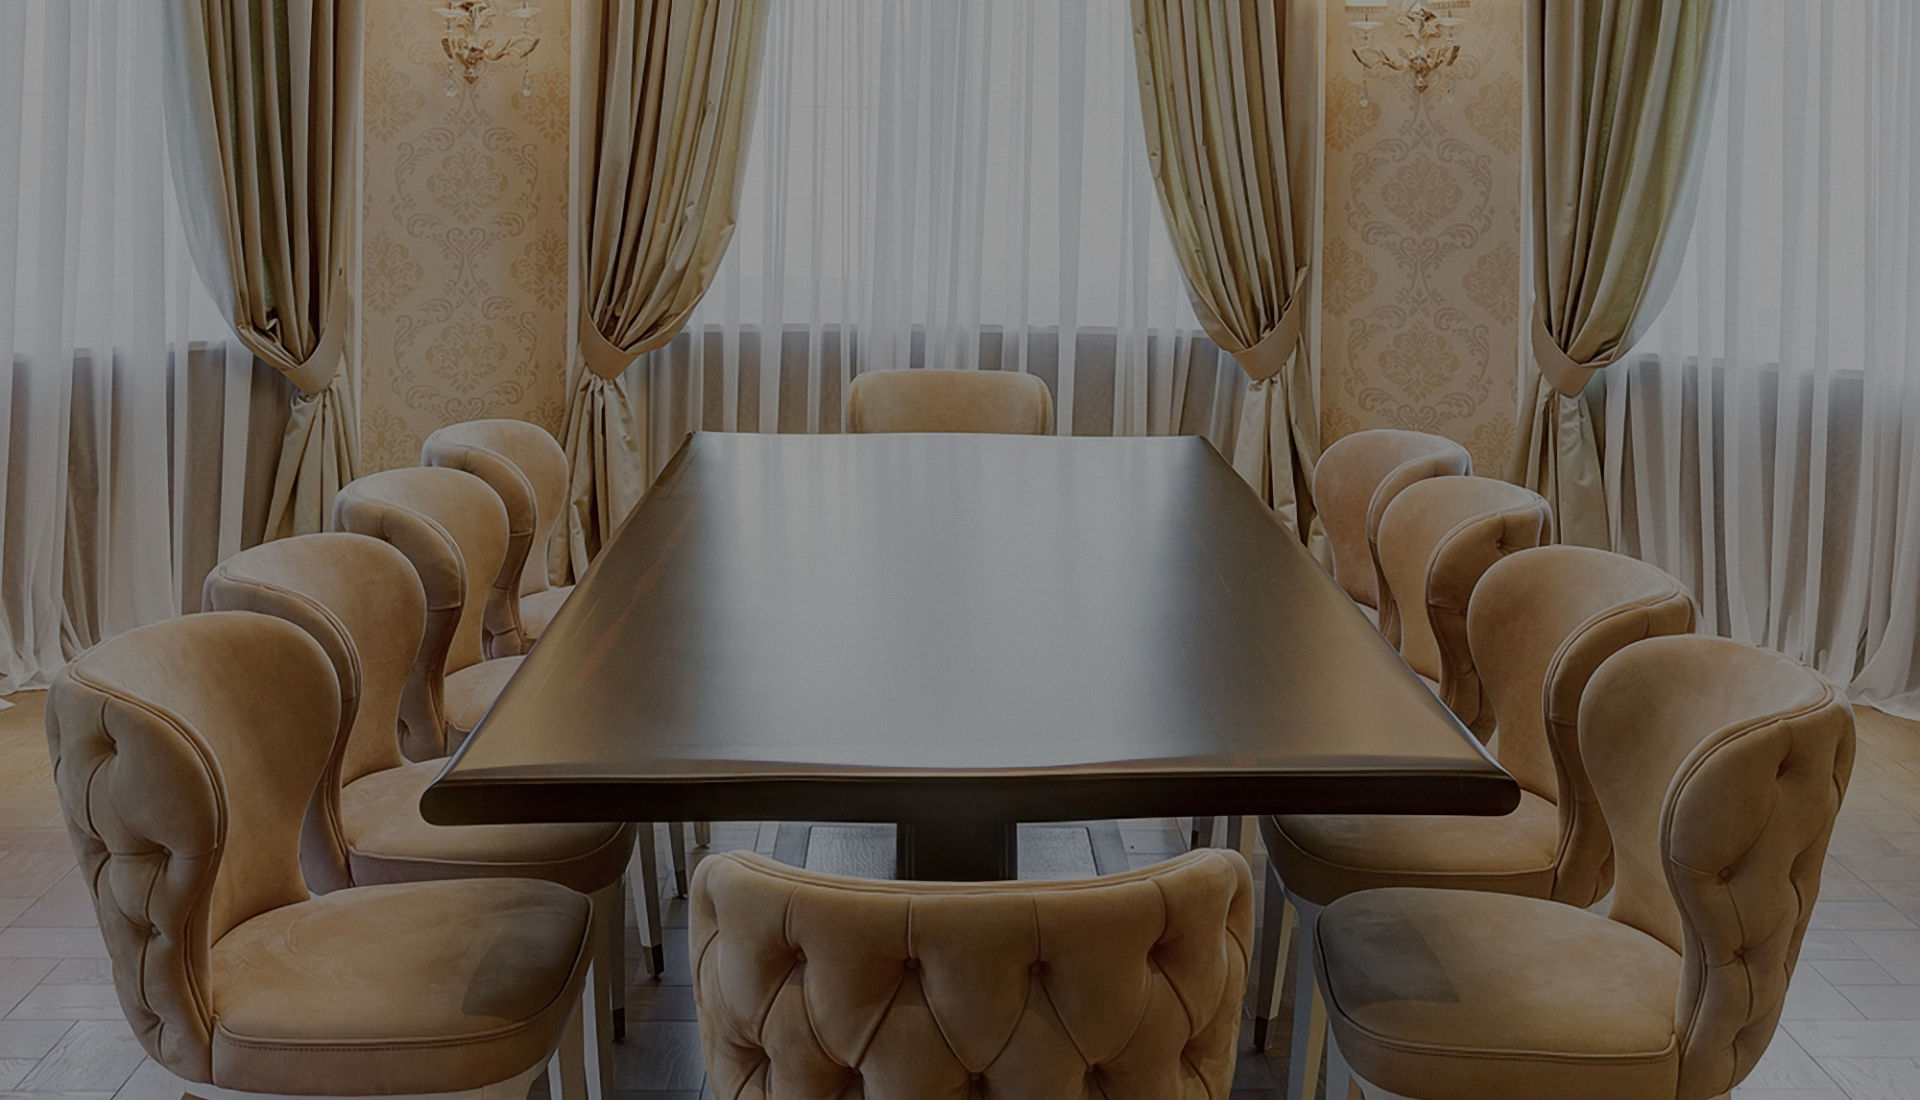 Tavoli mobilifici riuniti busiol brugnera pordenone for Brugnera mobili